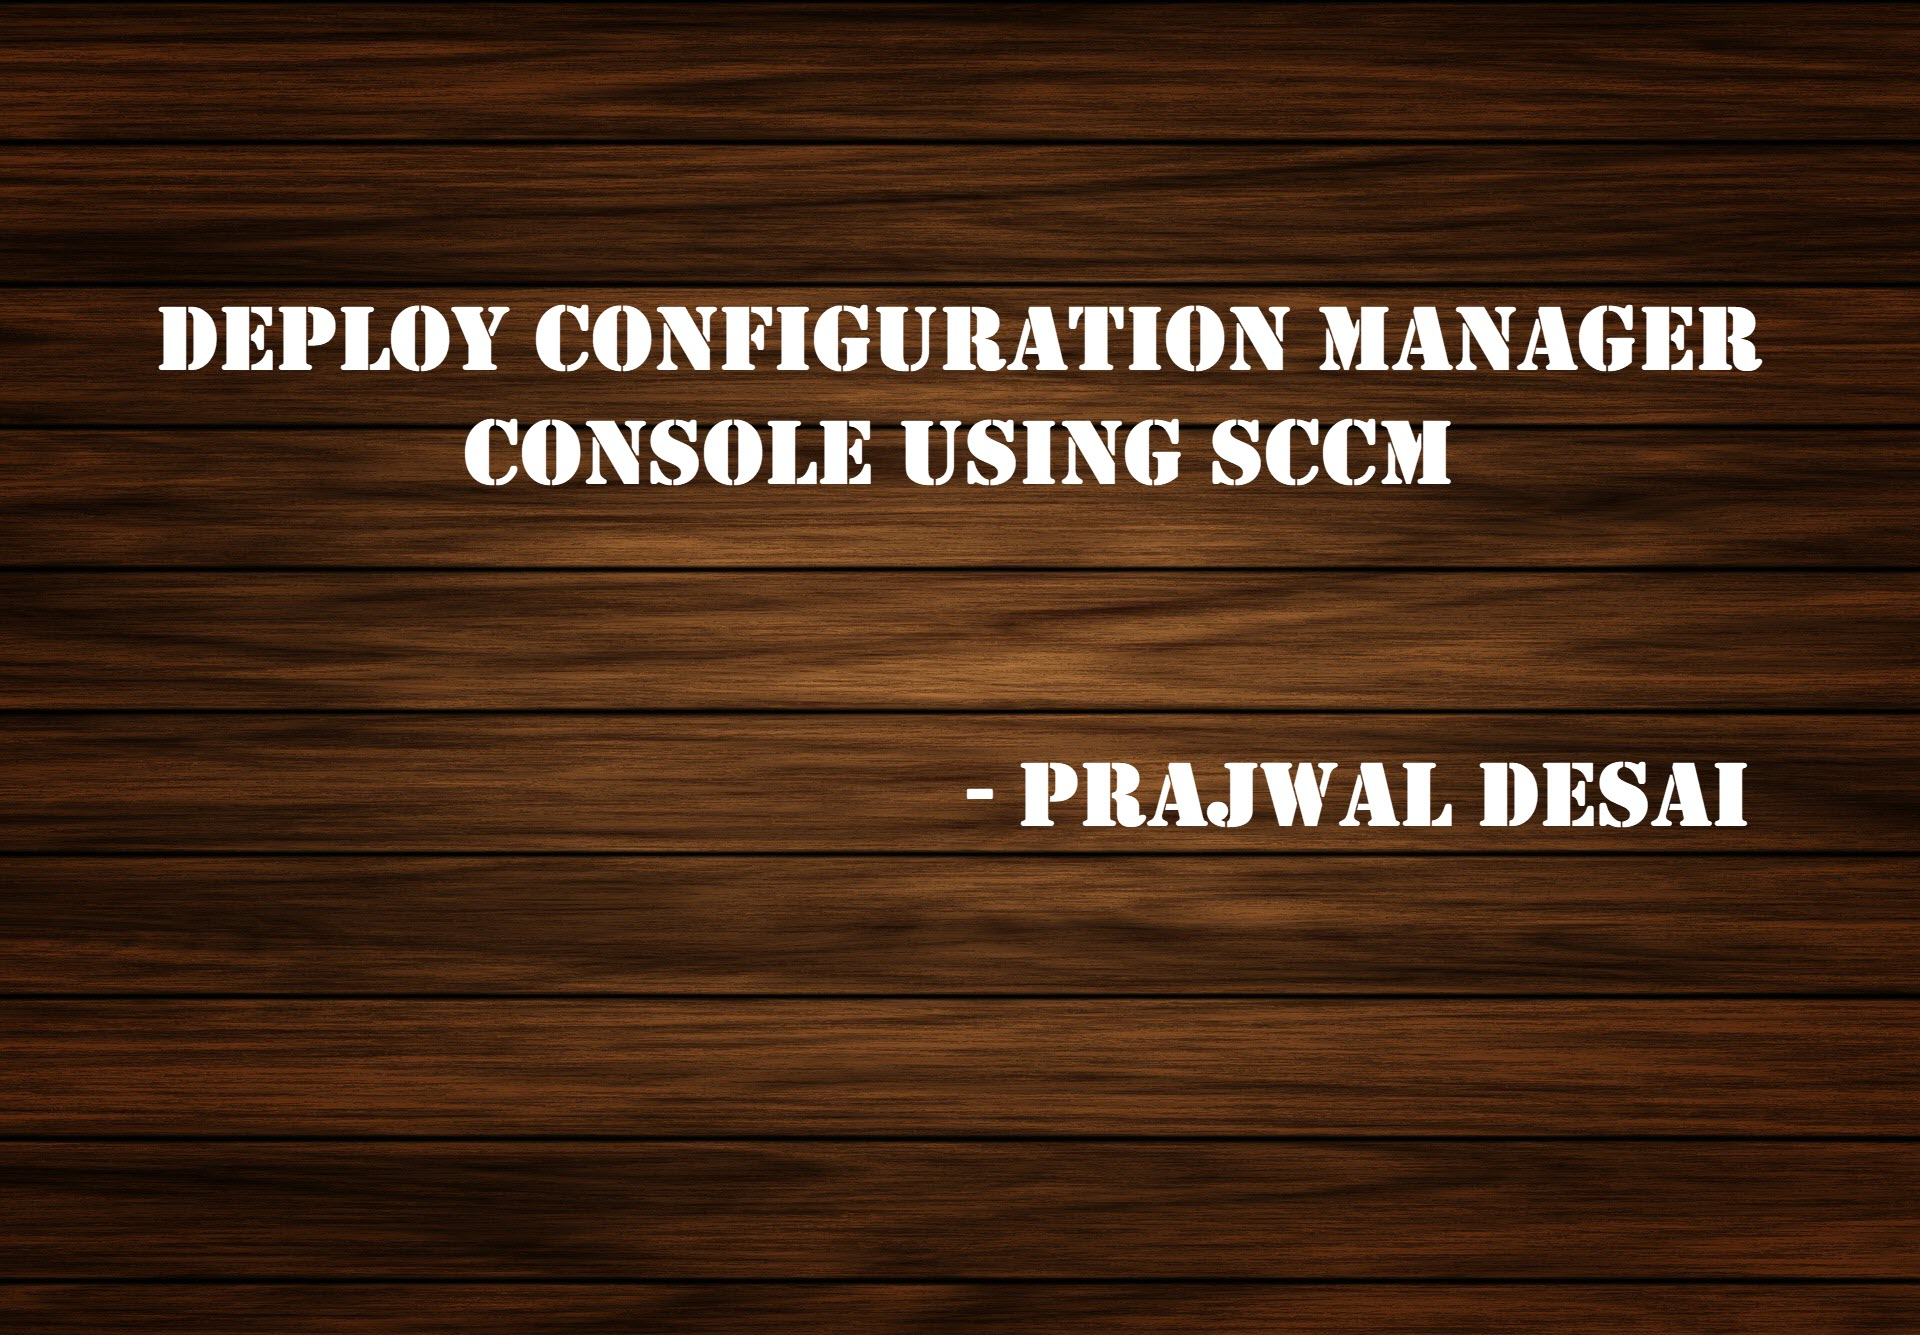 sccm console deployment ftimg